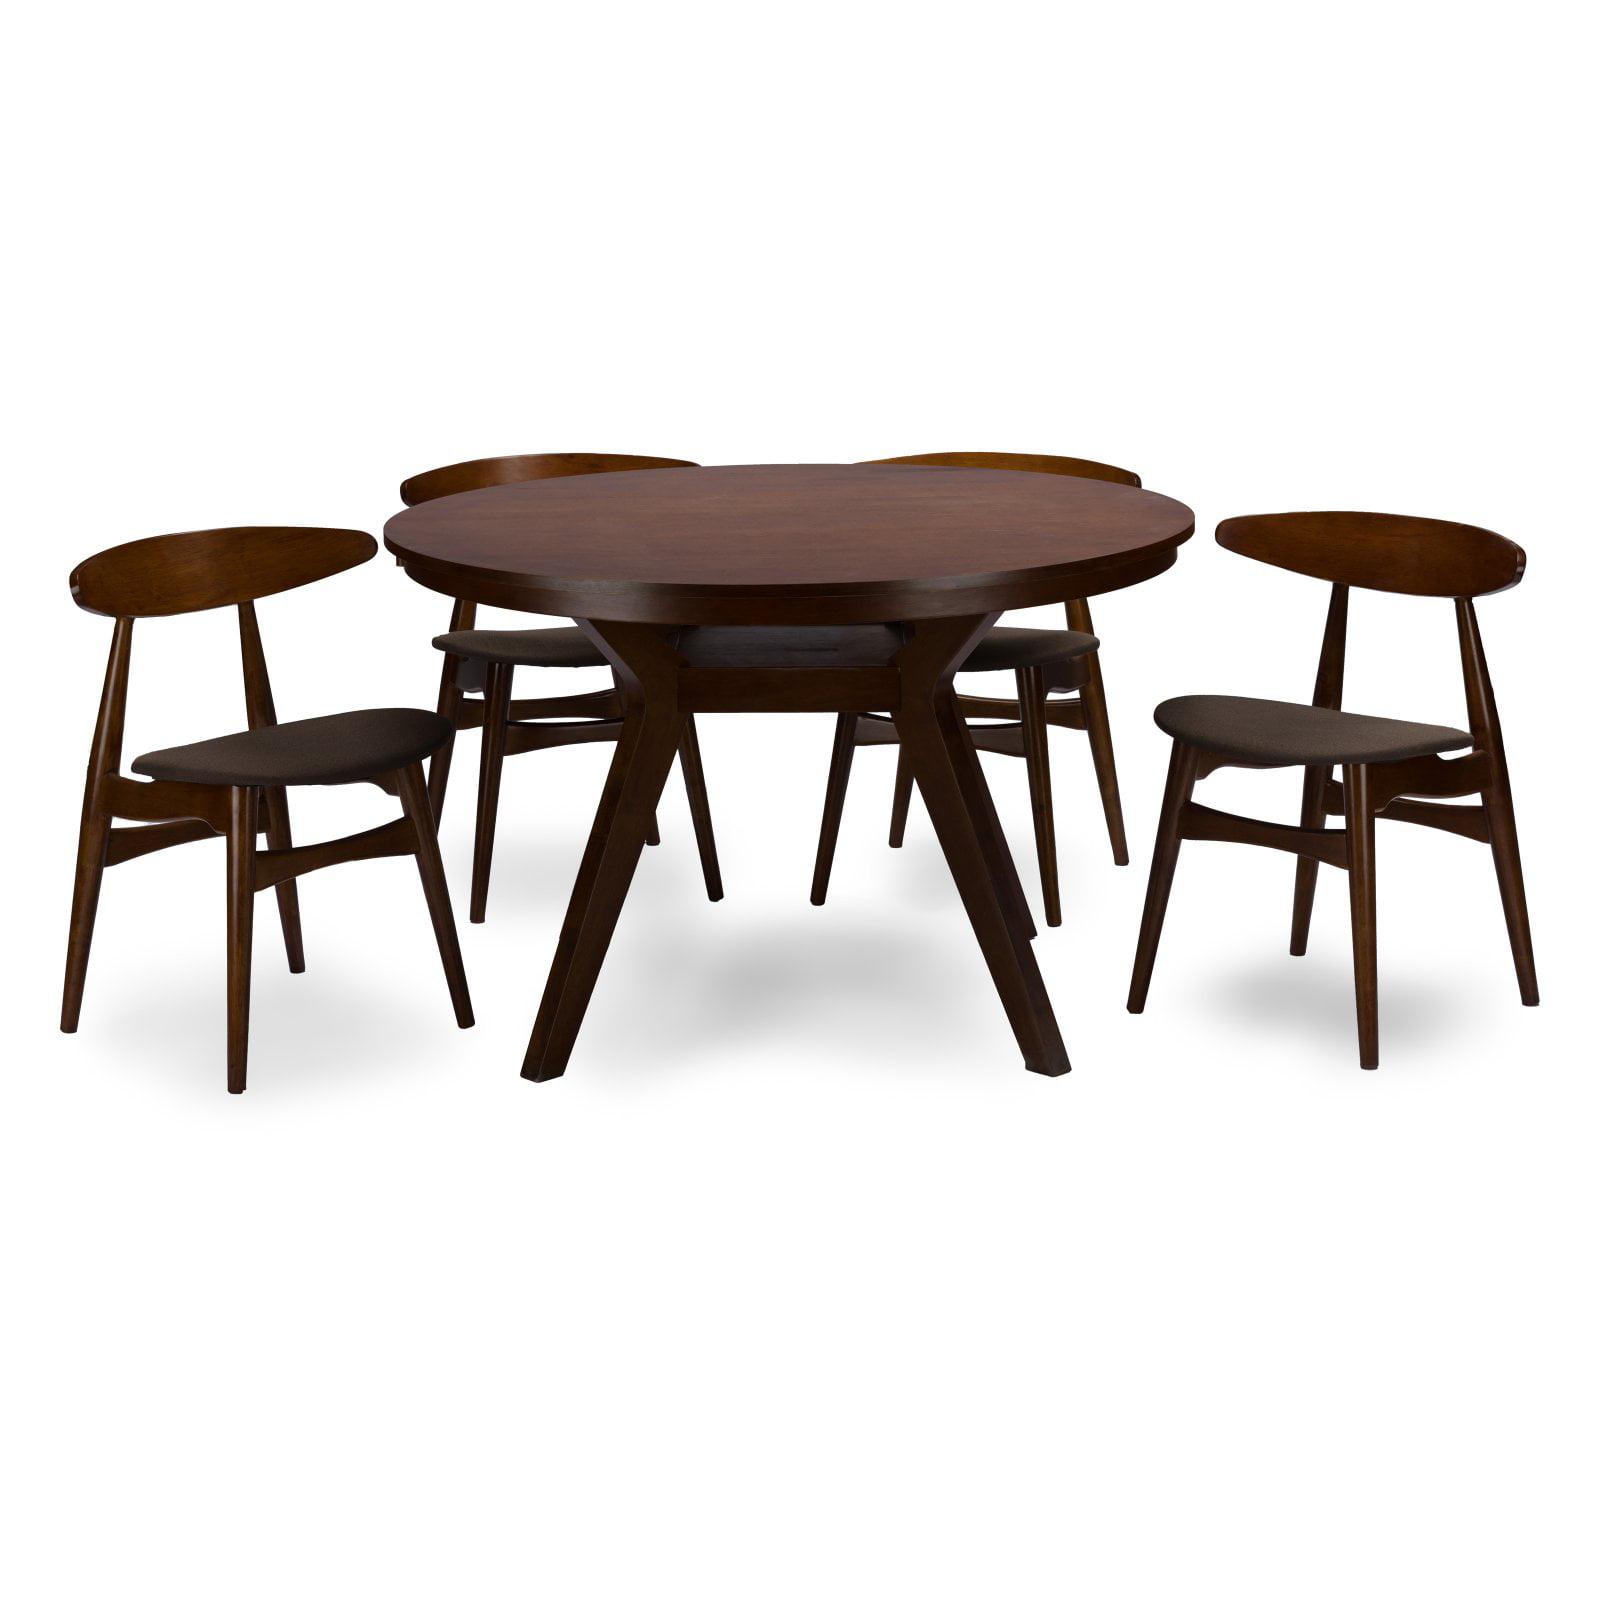 Baxton Studio Flamingo 5 Piece Round Dining Table Set